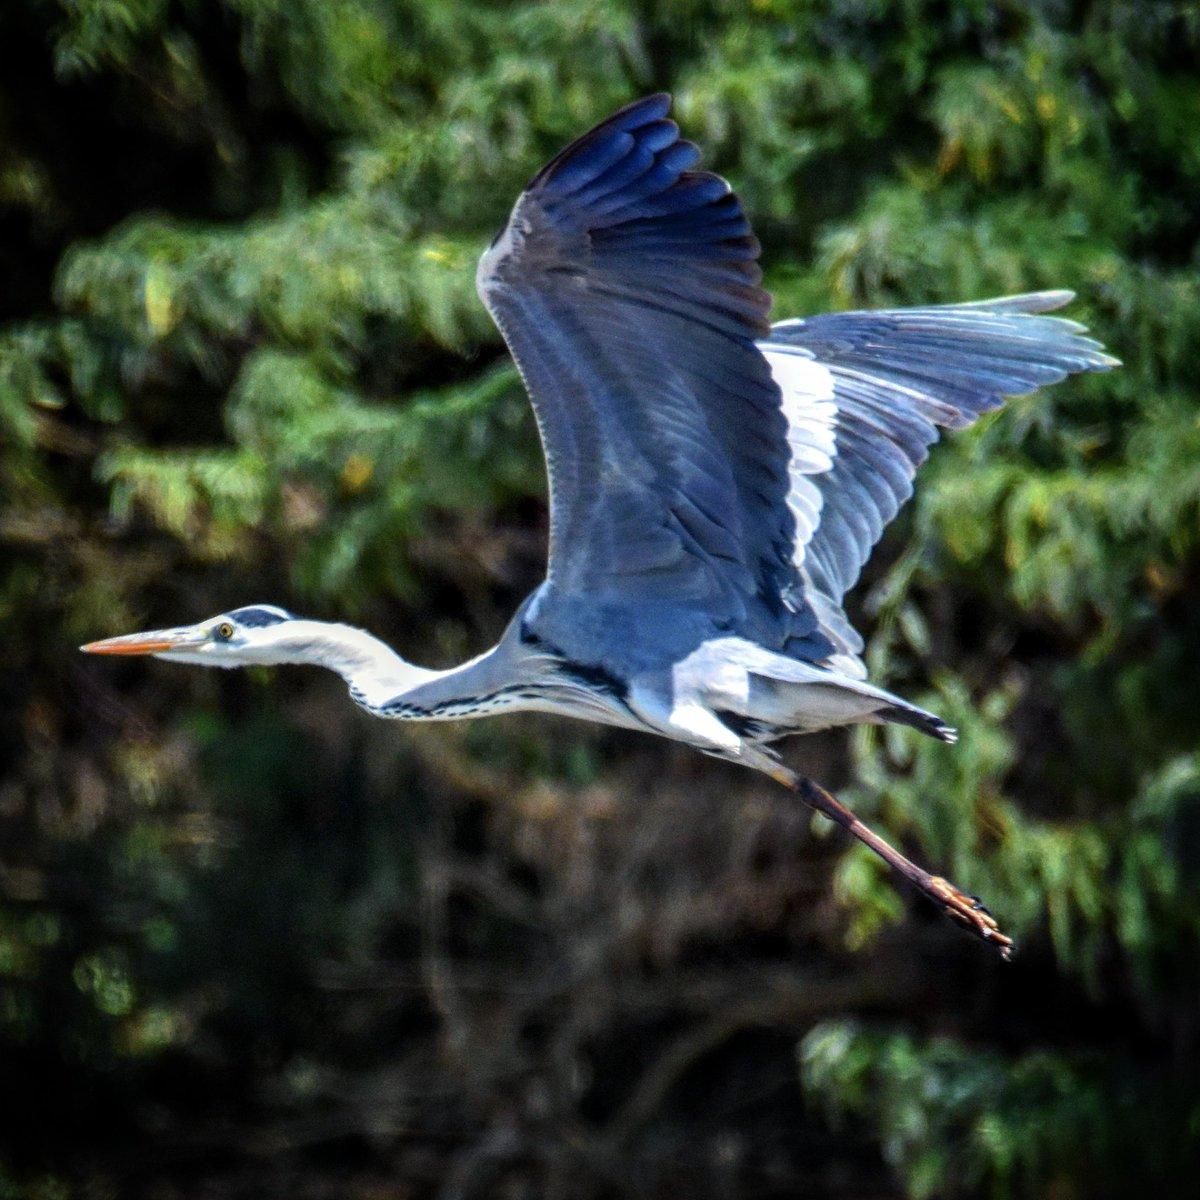 Grey Heron Location #Bahra #Makkah Region #SaudiArabia #birds #photooftheday #wildlife #nature #naturephotography #photography #photographer #amazing #travelblogger #birdsphotography #tourism #beauty #wildlifephotography #photo #ksa #beautiful @SaudiMagazine @IASArabia @SapracOrg